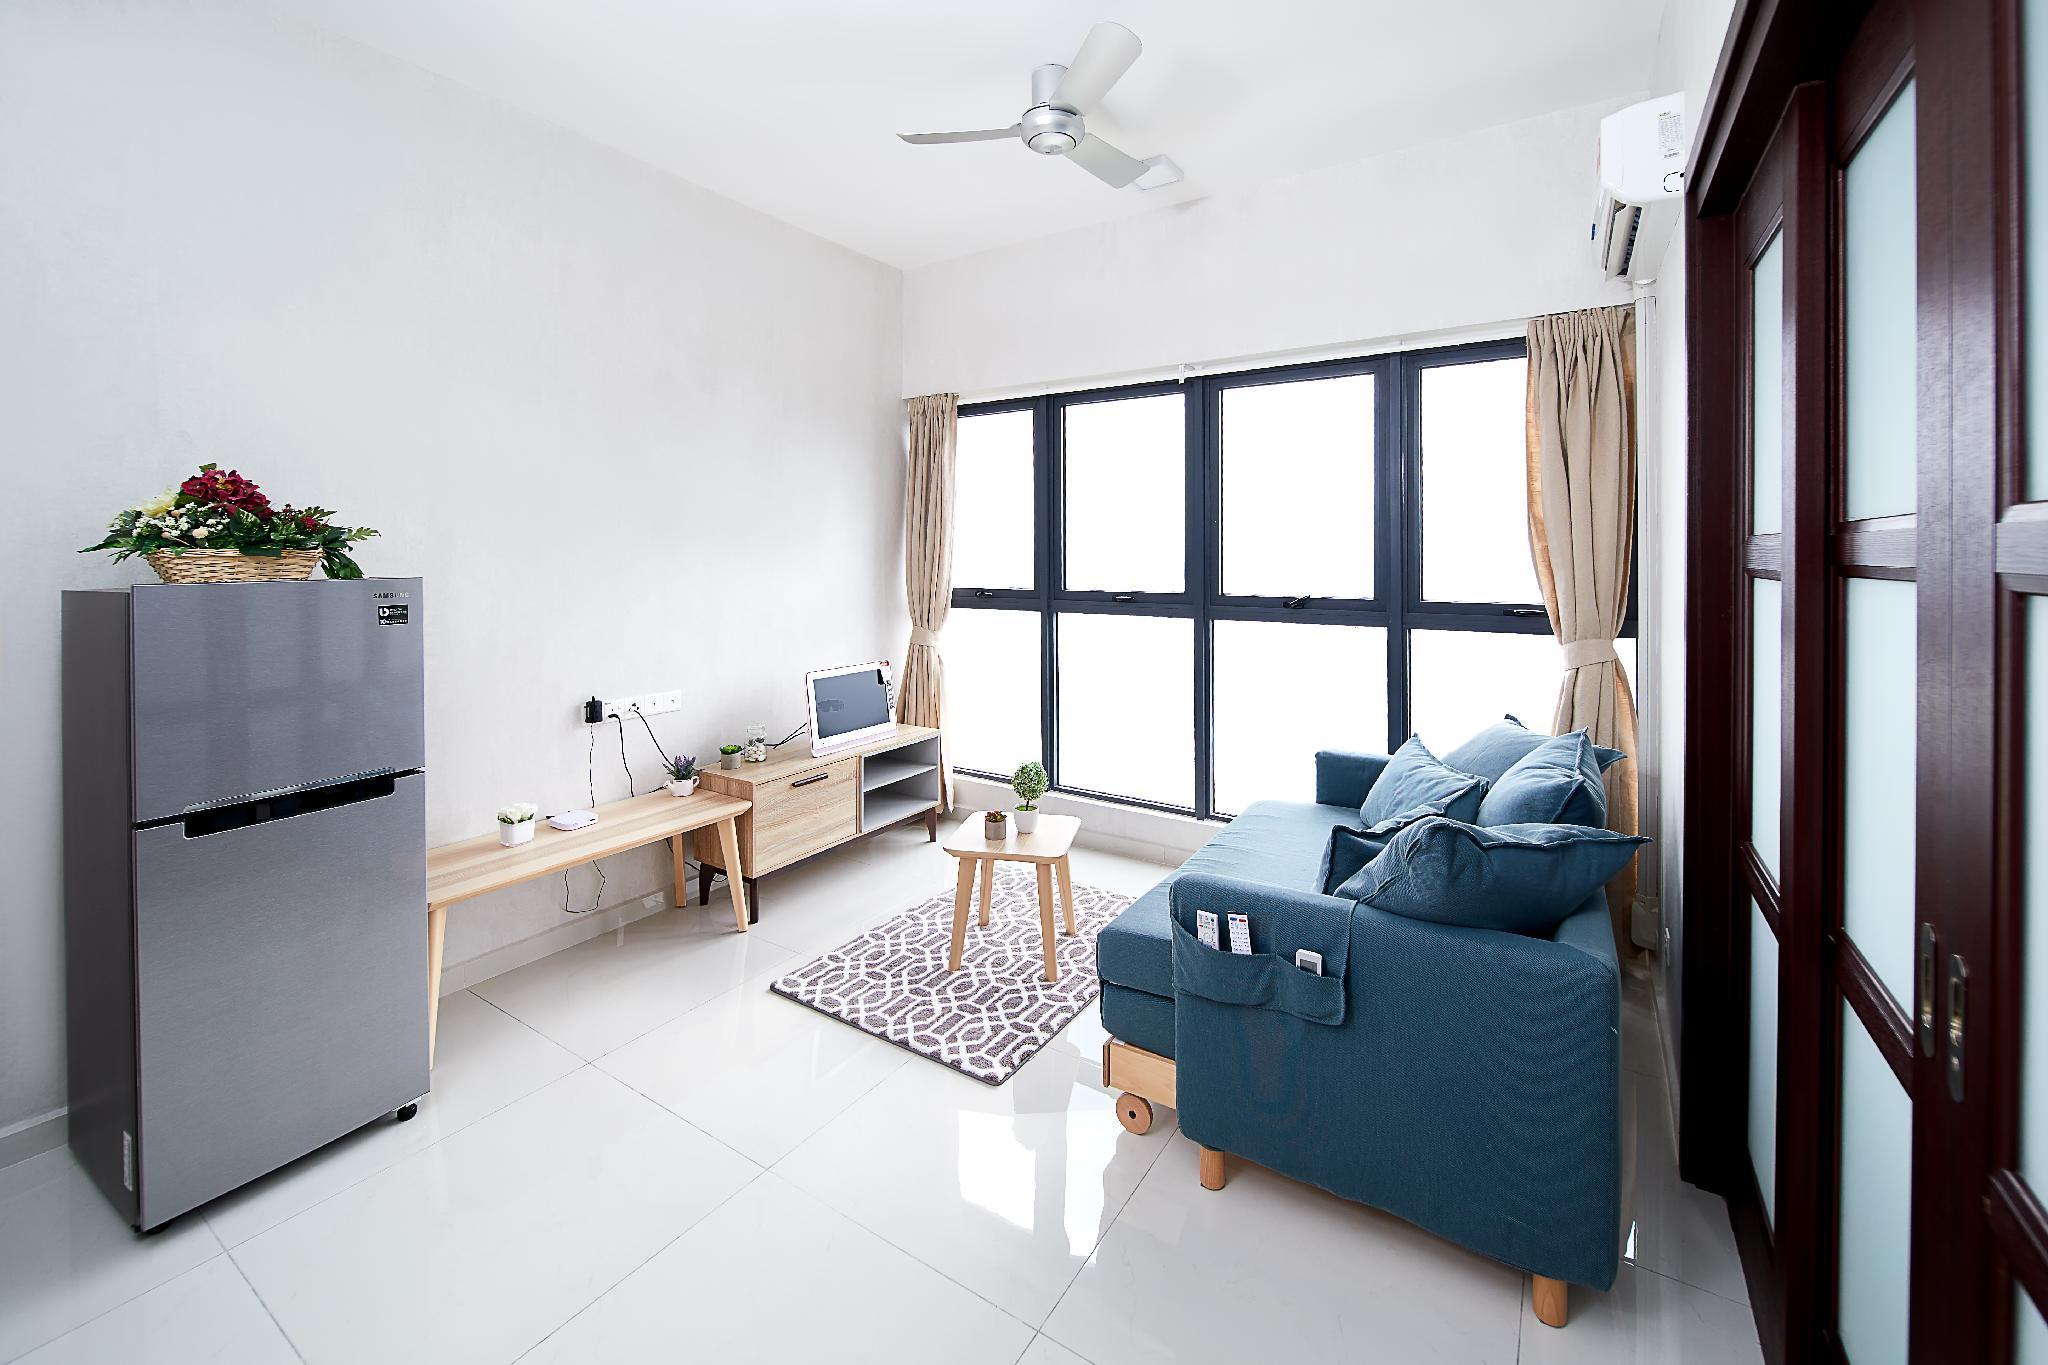 TownCenter DangaBay 10mSingapore 10mLegoland Beach